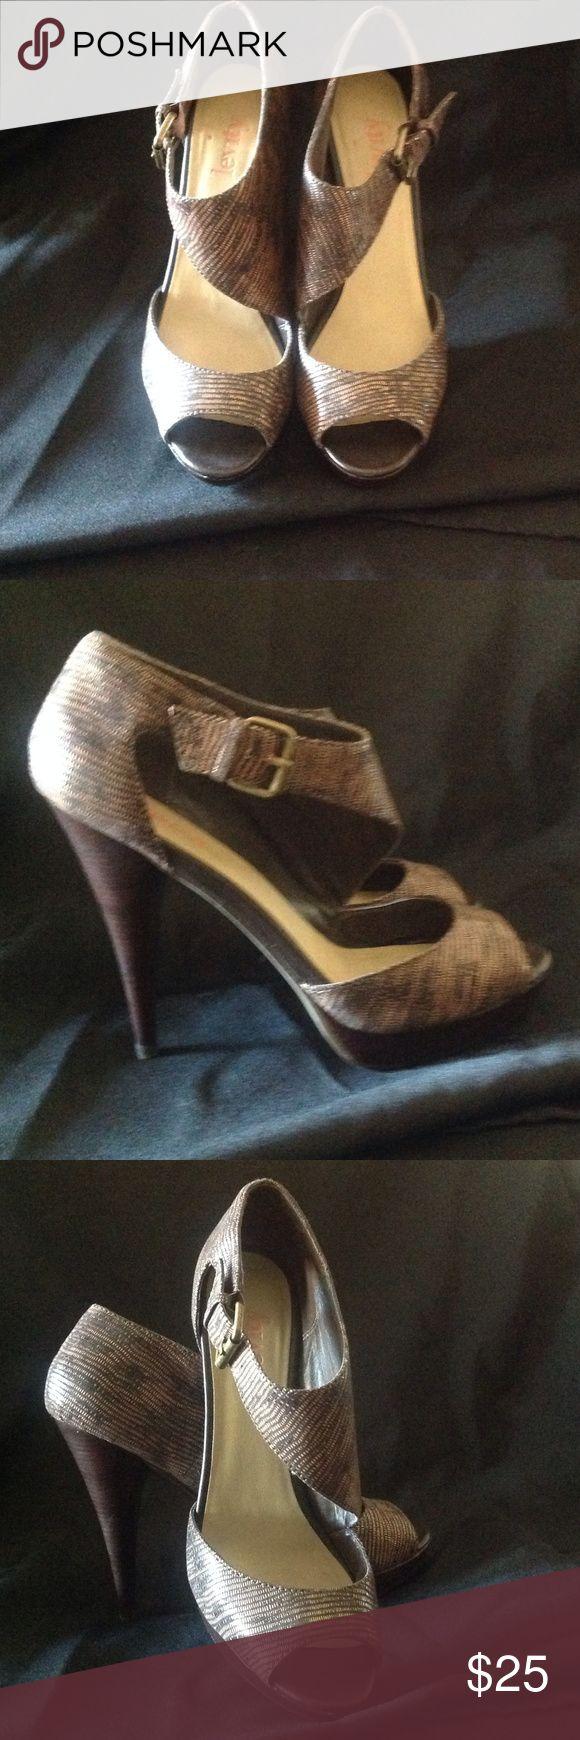 Levity high hells Beautiful, gently worn brown Levity brand pumps.  Sz 8.5 Shoes Heels